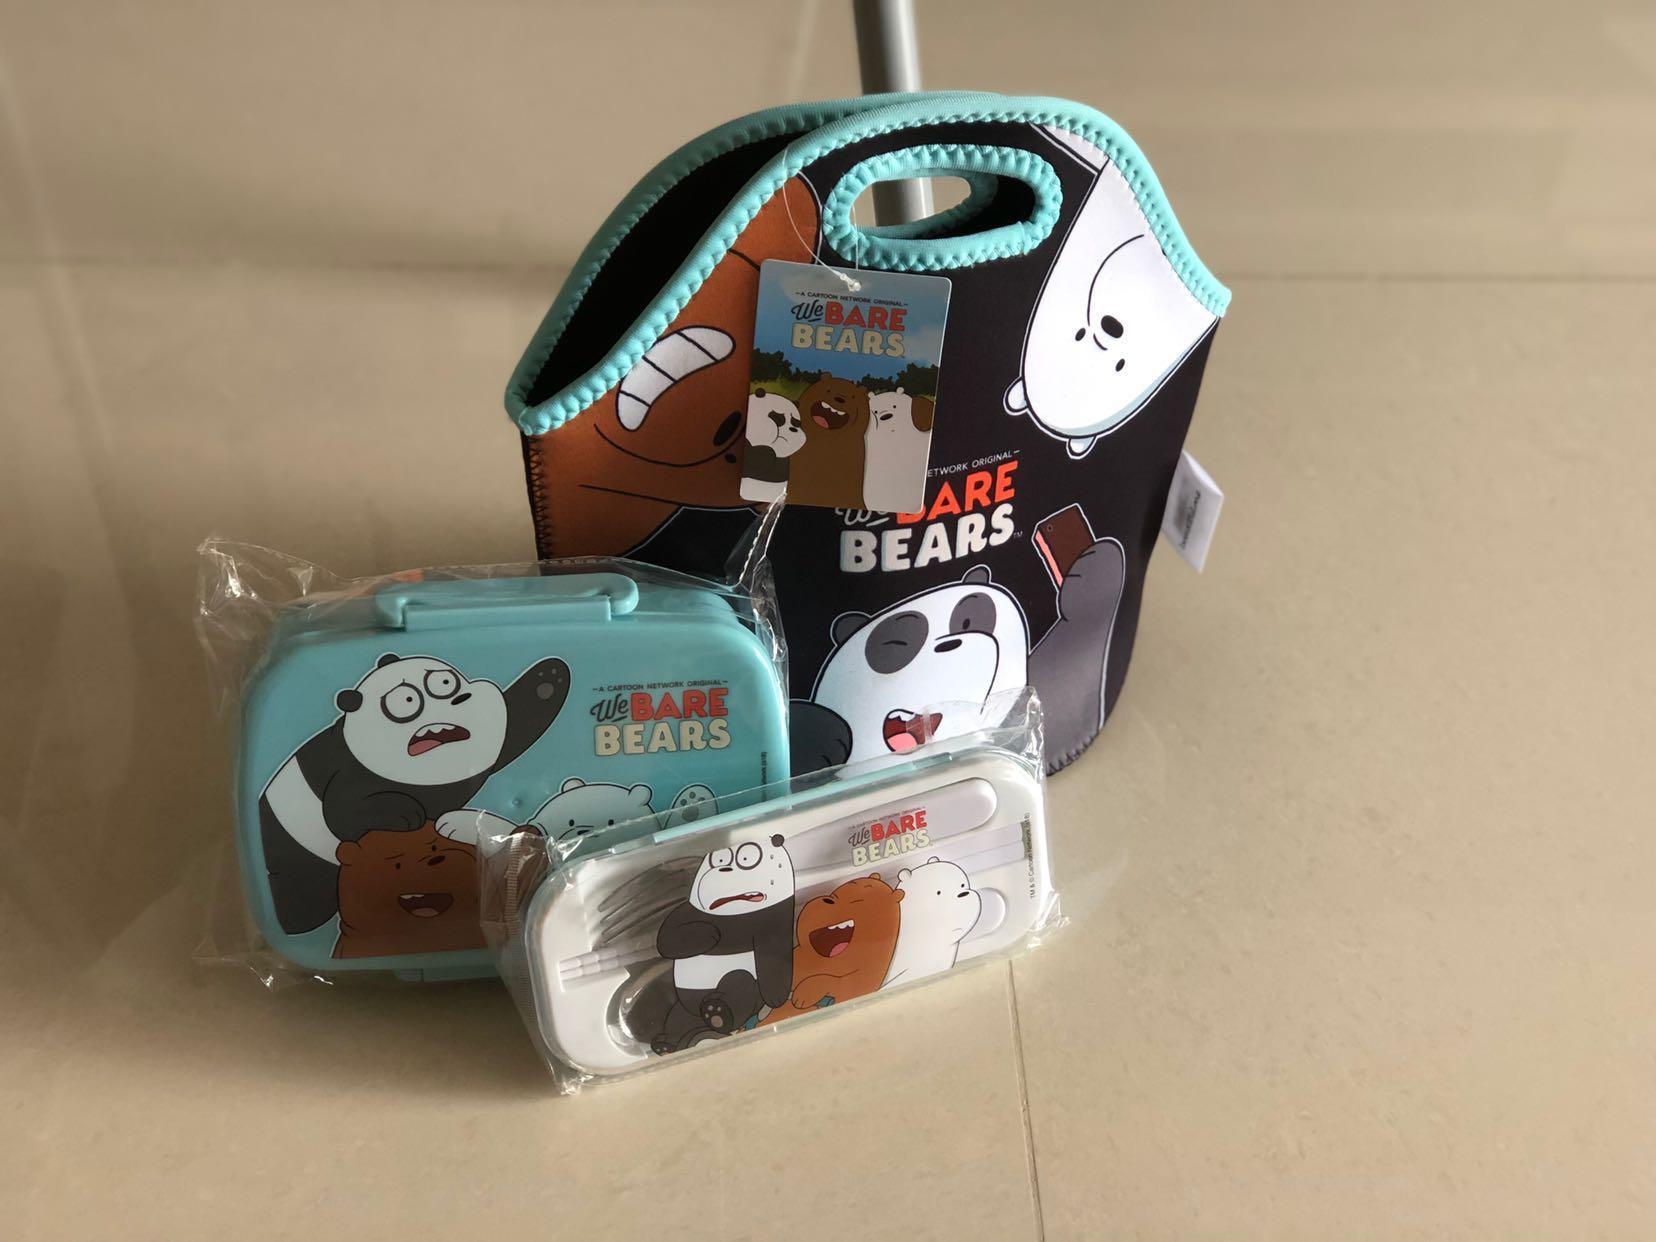 We Bare Bears Ice Bear lunch box set, Babies & Kids, Nursing